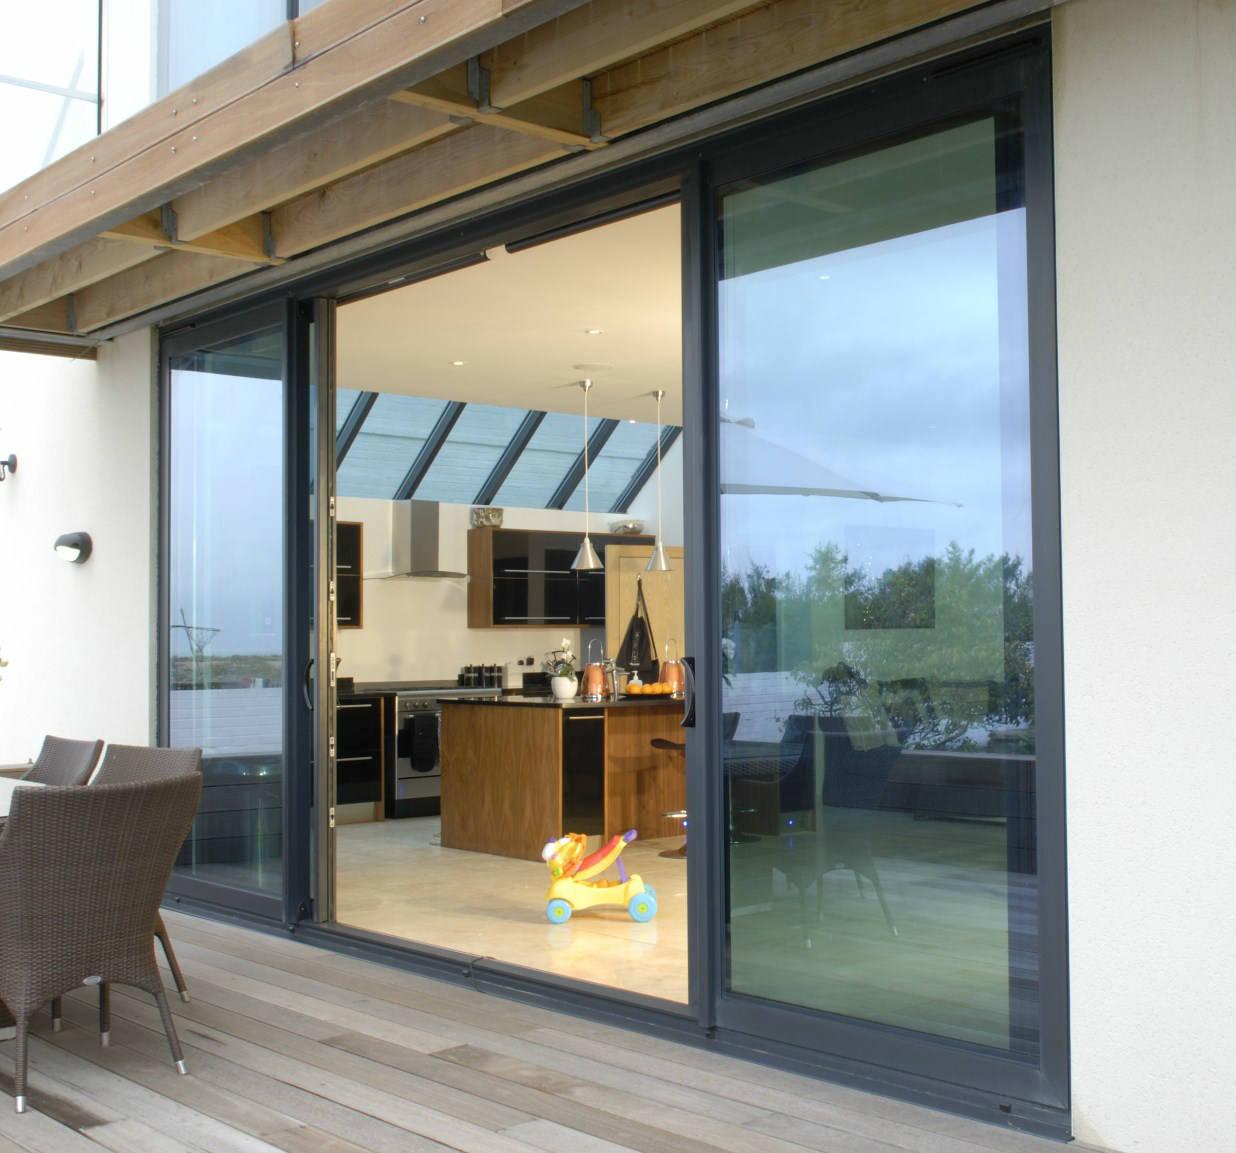 Slimline Aluminium Sliding Doors Large Glass Panels